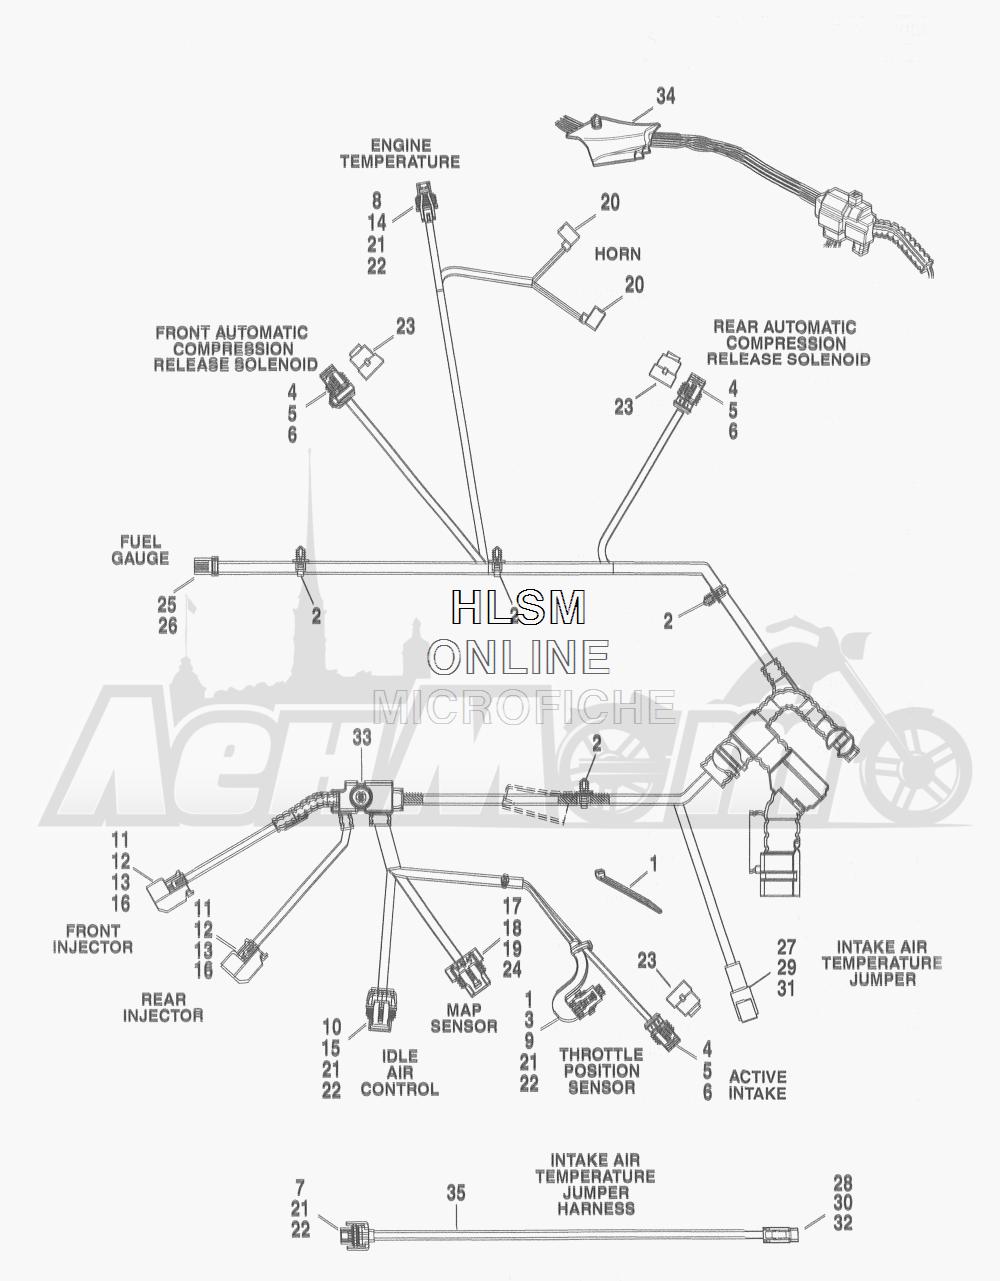 Запчасти для Мотоцикла Harley-Davidson 2016 FLD DYNA 103 SWITCHBACK (GZM) Раздел: WIRING HARNESS_ MAIN - ABS - 5 | электропроводка главный жгут ABS 5